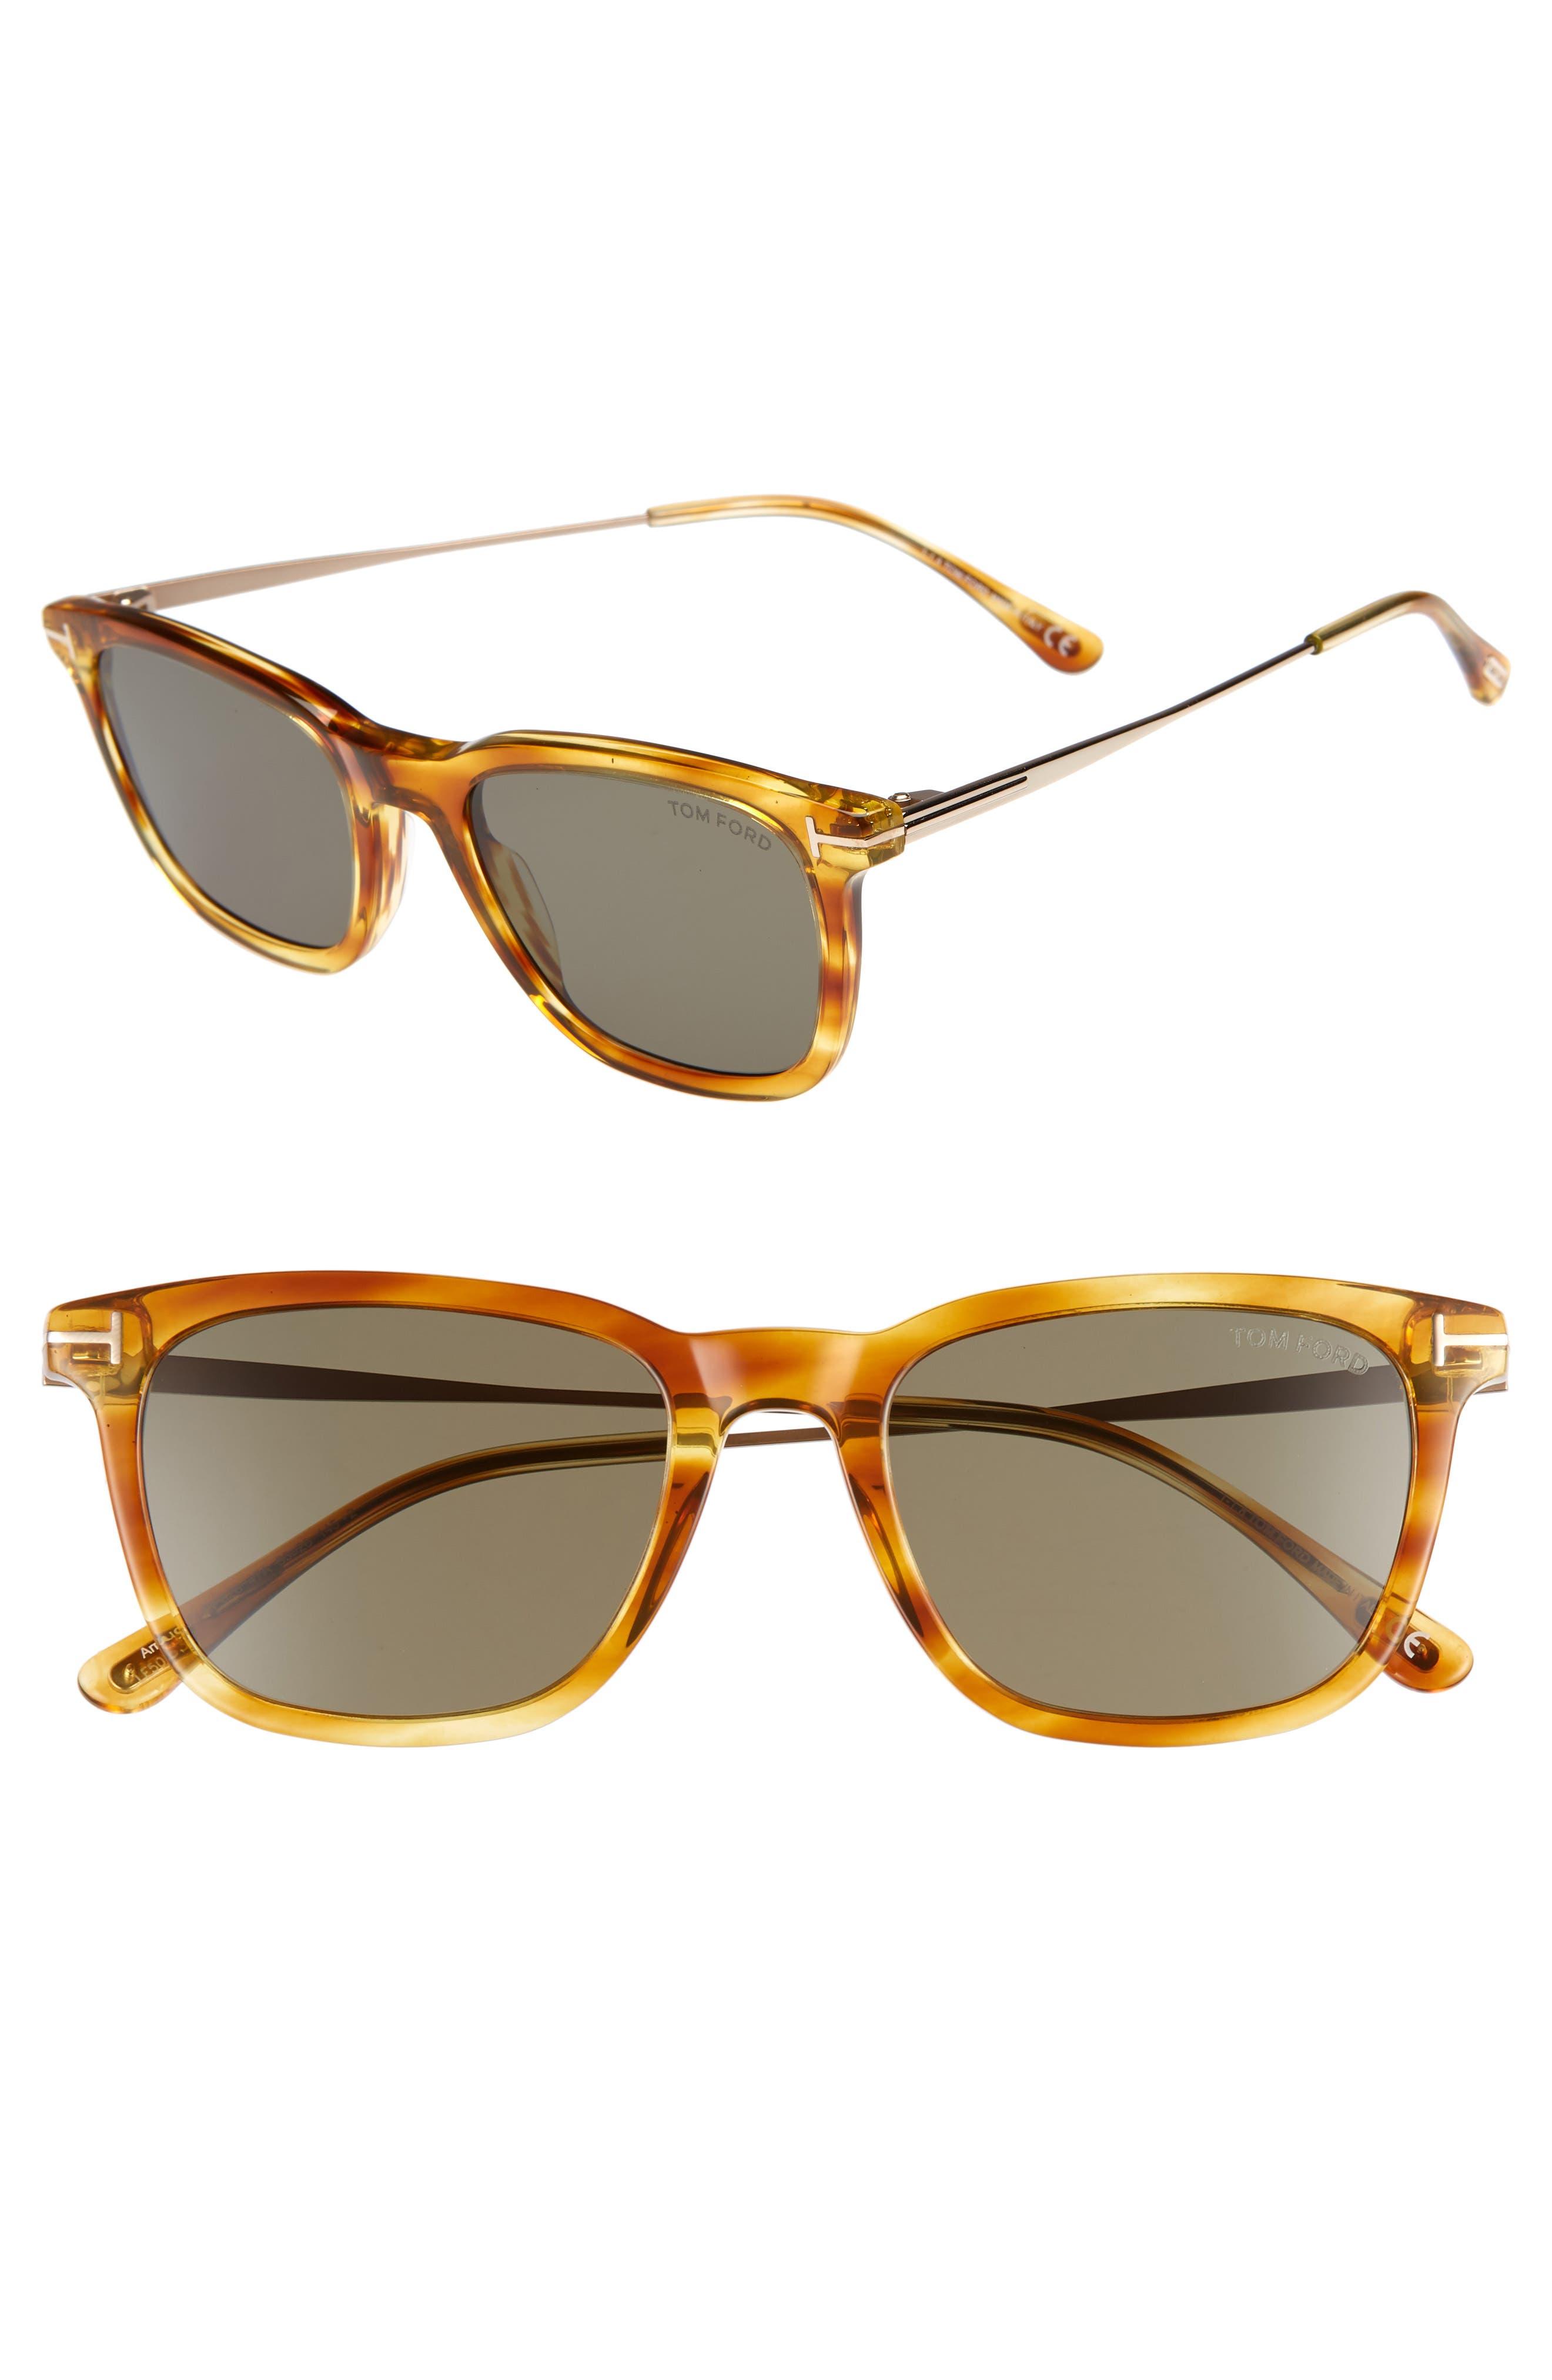 53mm Rectangle Sunglasses,                         Main,                         color, LIGHT BROWN/ SMOKE